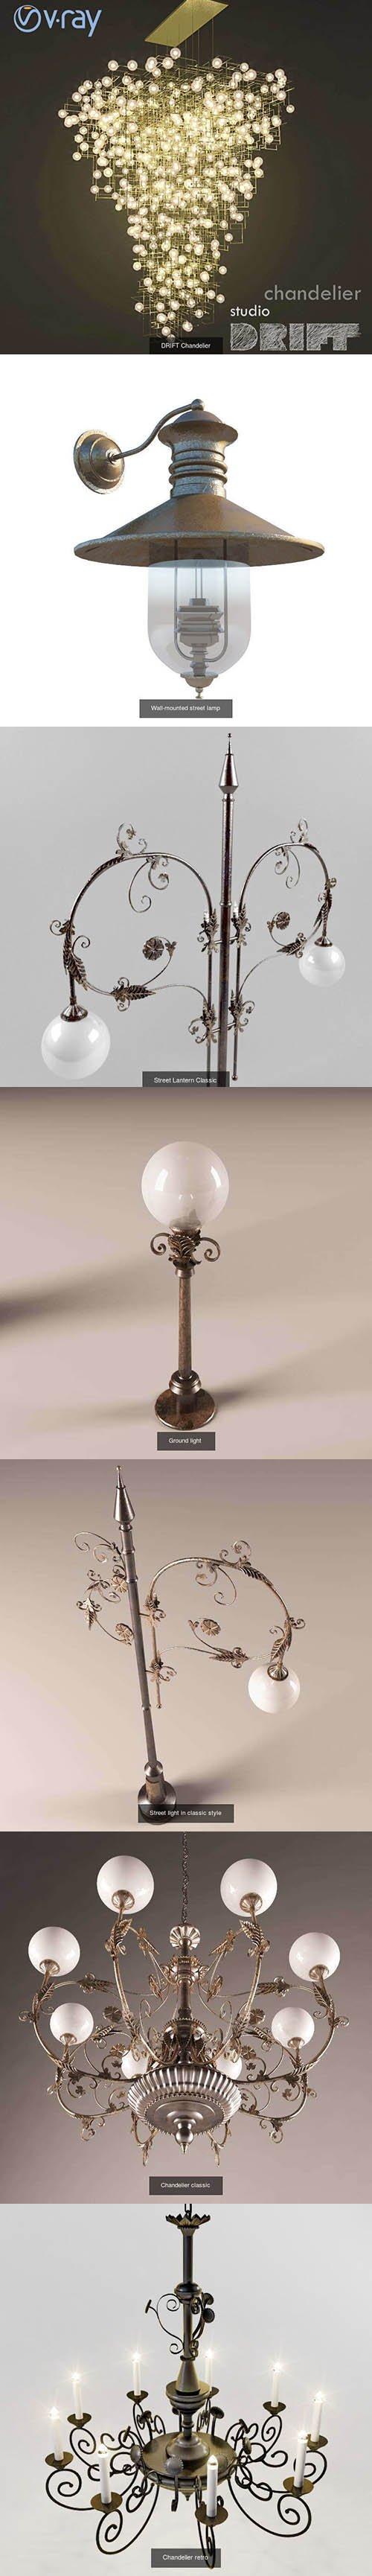 Lighting bundle 3D Model Collection